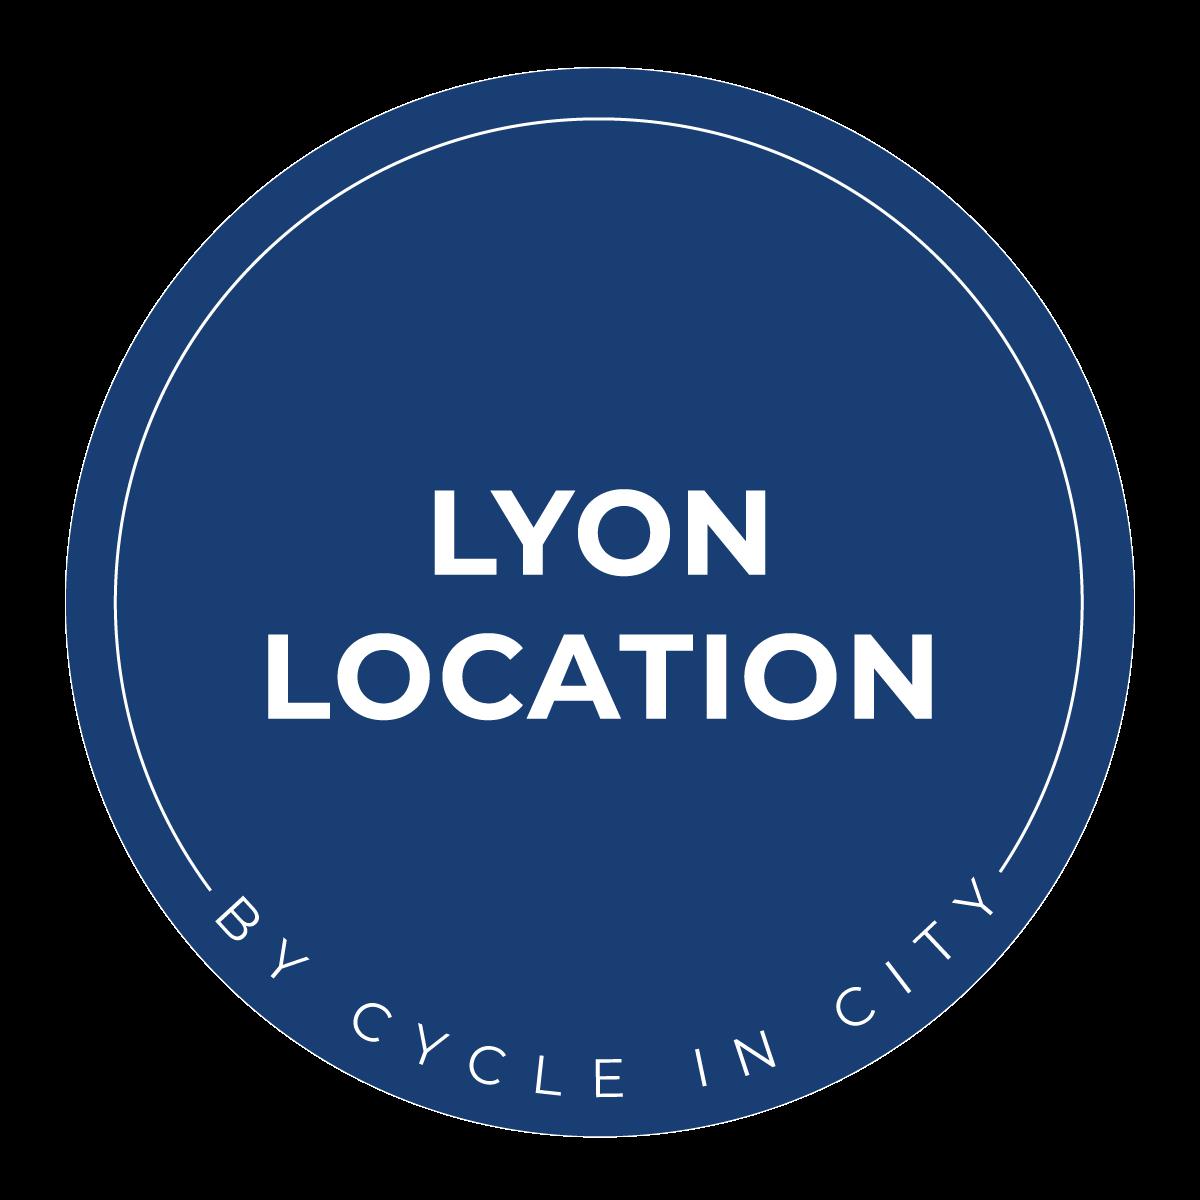 Lyon Location